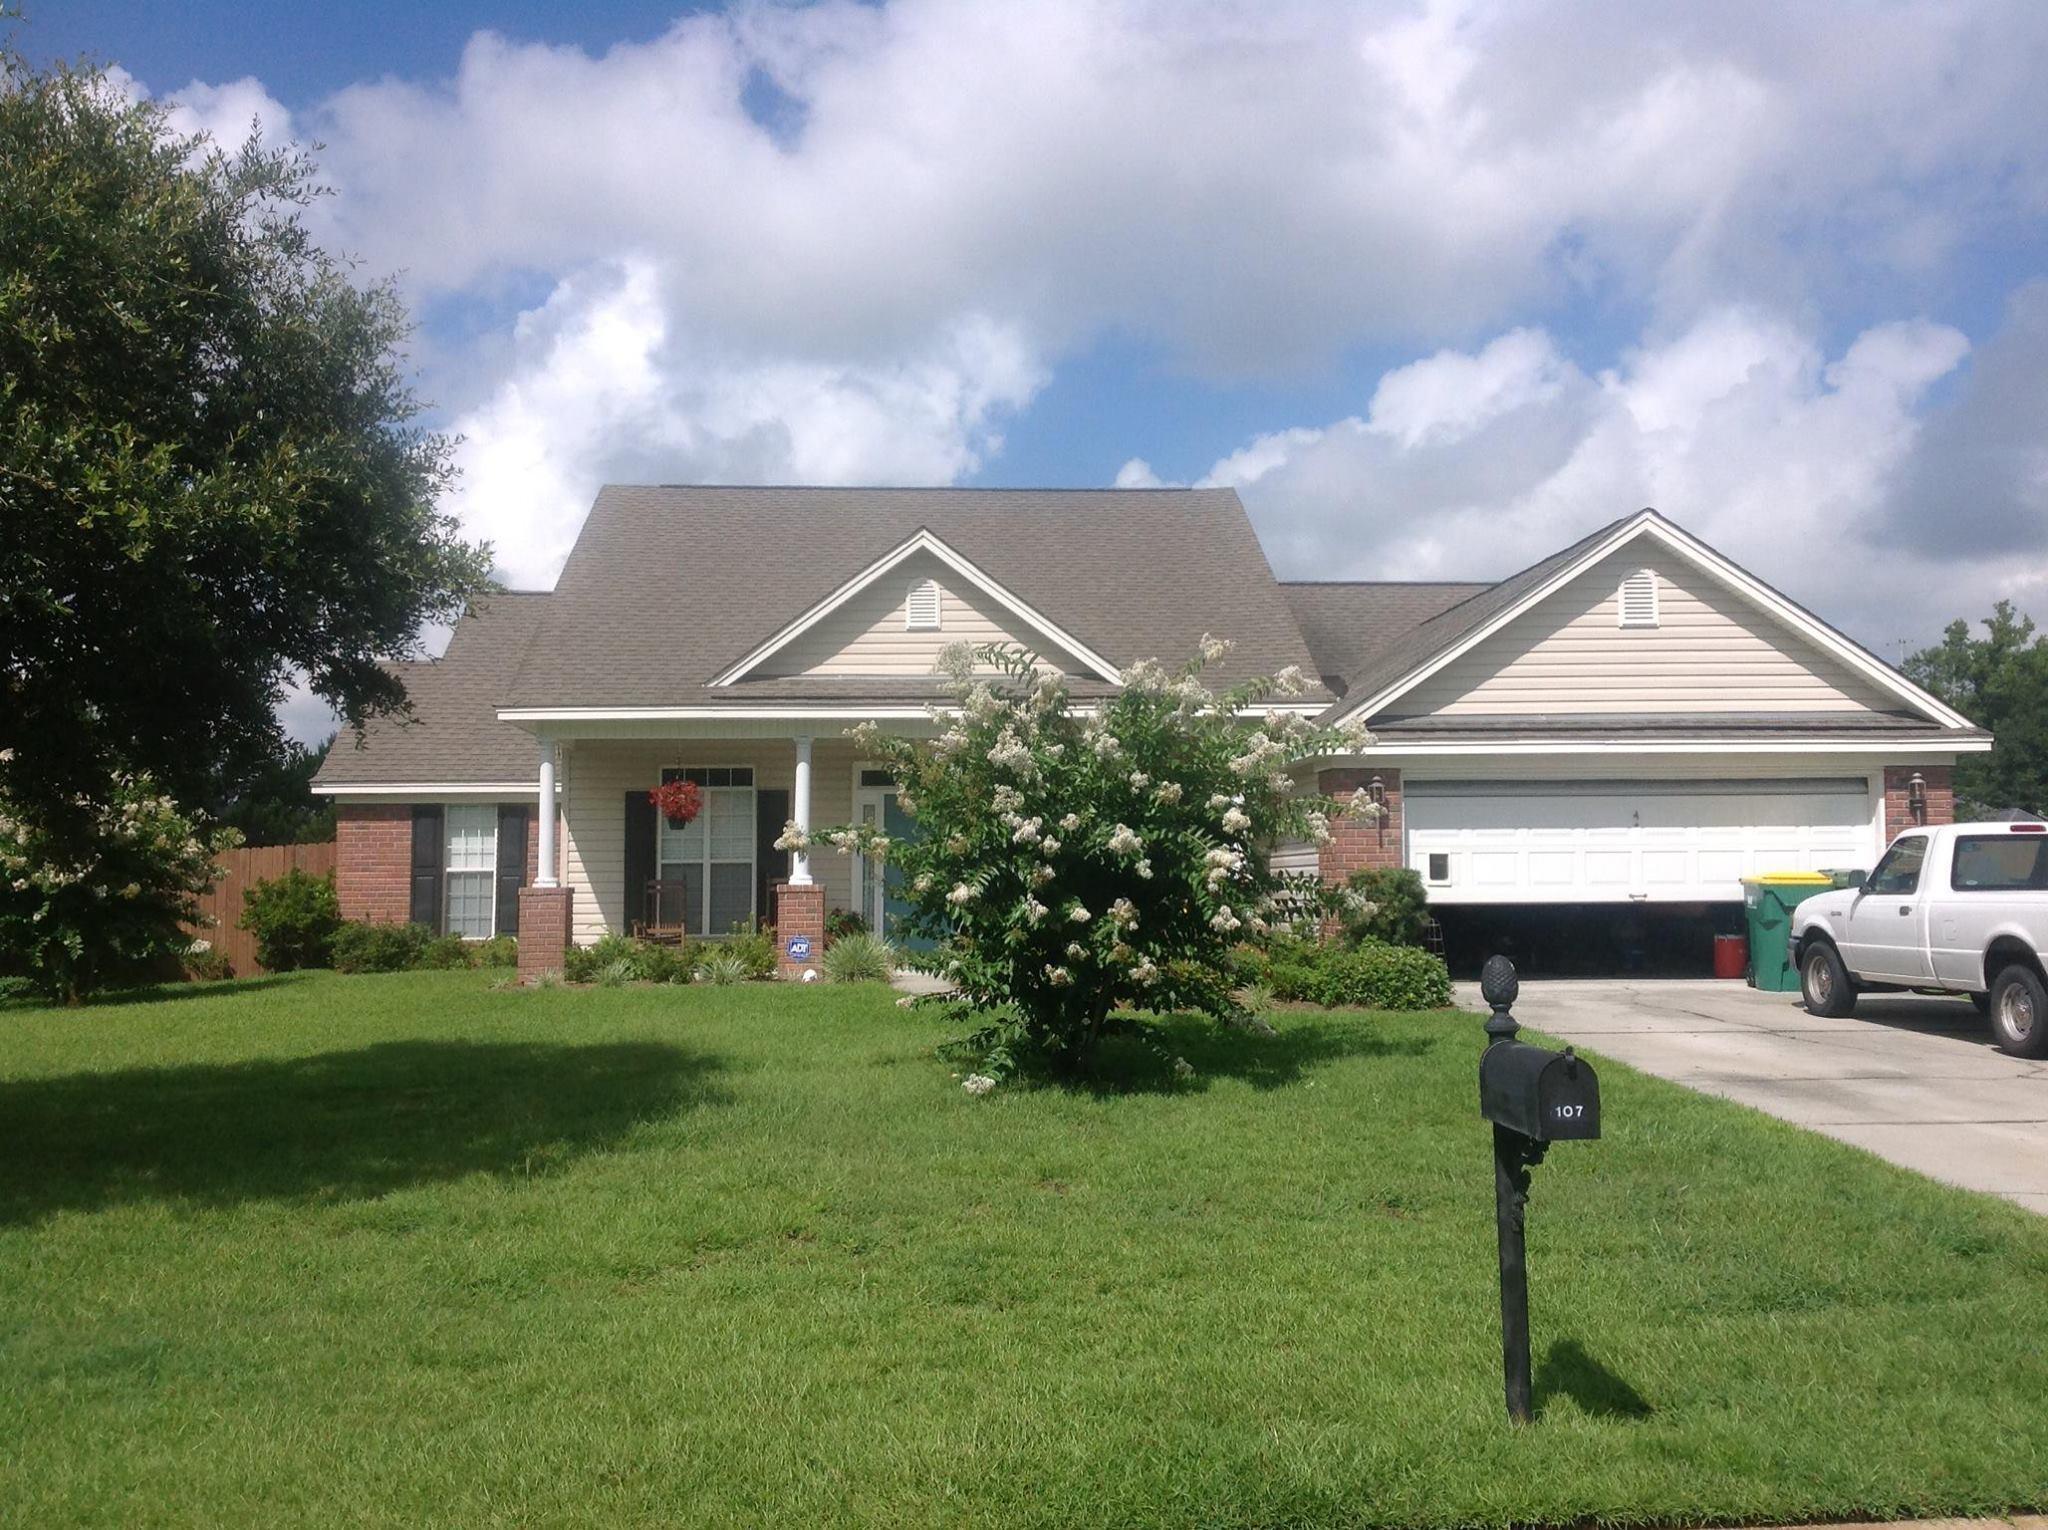 RoofCrafters-Savannah image 24